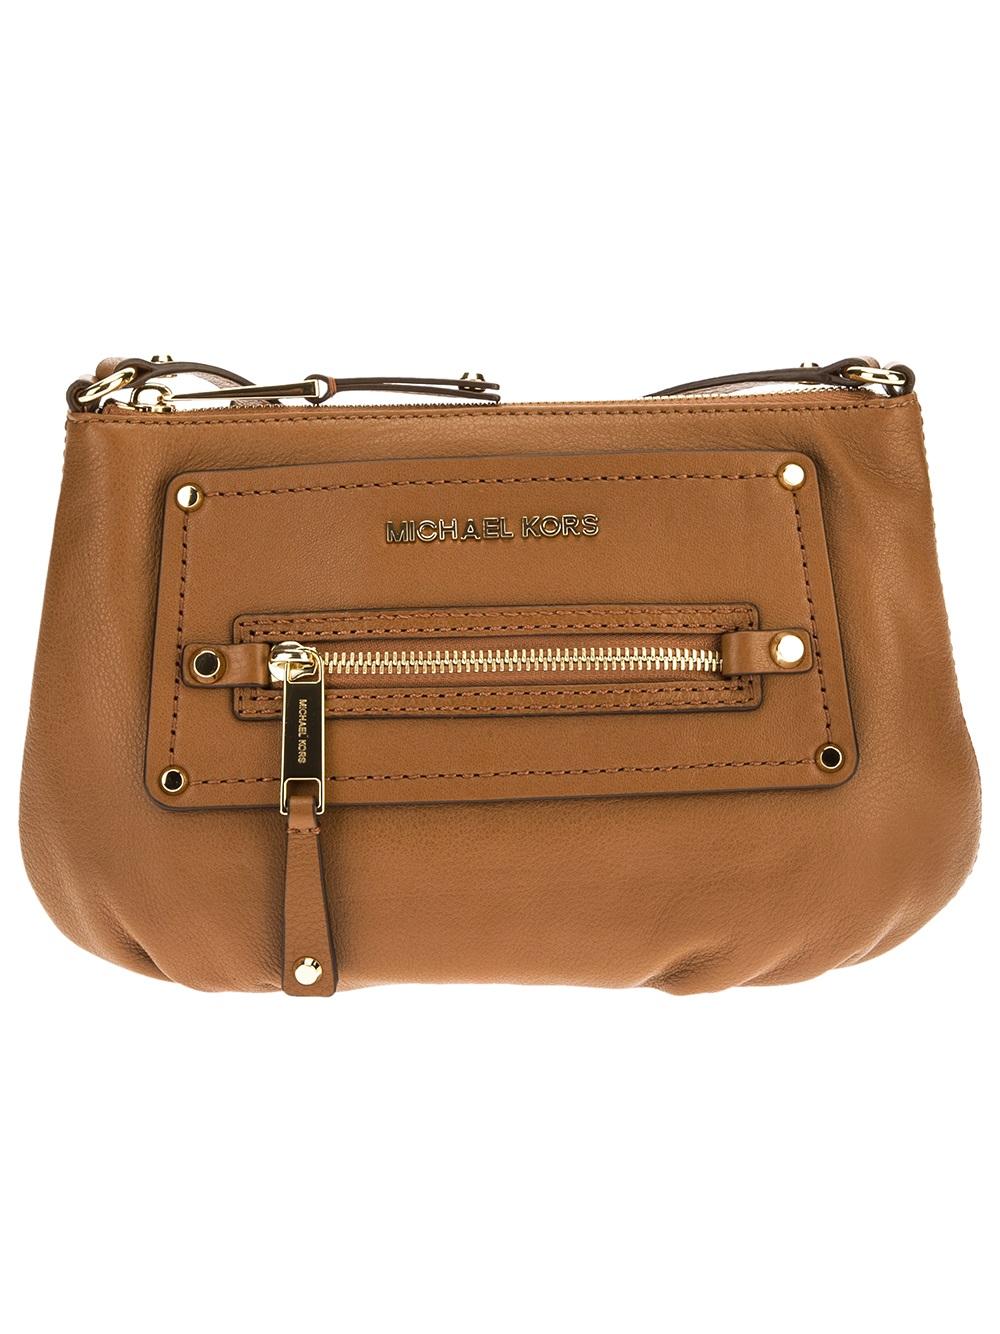 1fccf8eb7eb4 ... wholesale lyst michael kors gilmore satchel in brown bd752 d8f39